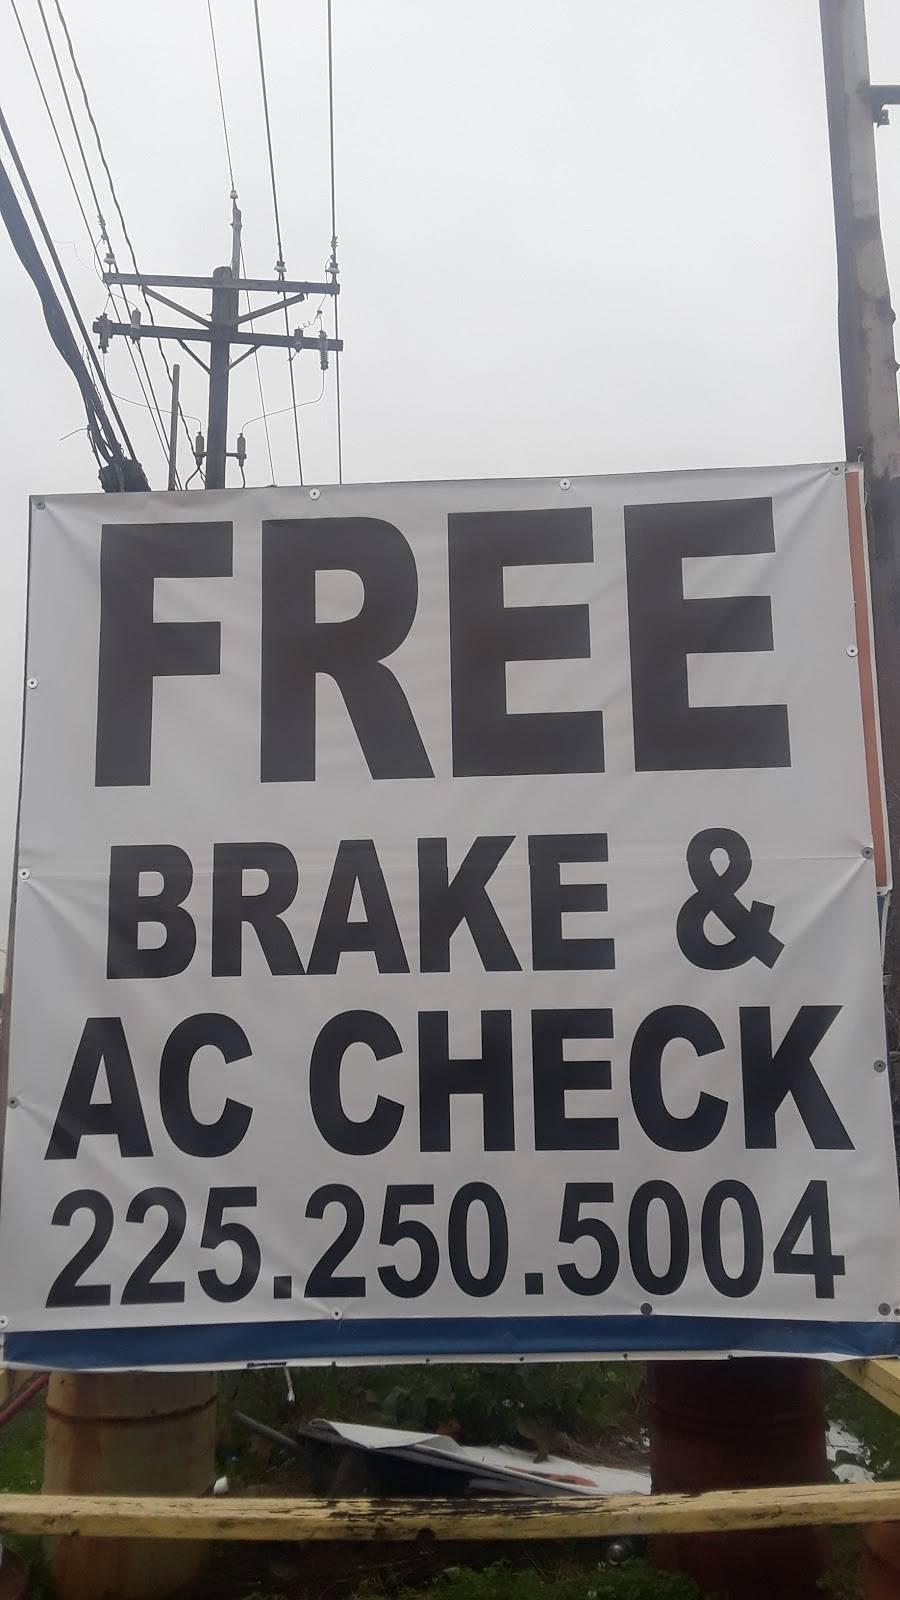 M&A Tiger inc mechanic shop - car repair  | Photo 3 of 5 | Address: 12689 Florida Blvd, Baton Rouge, LA 70815, USA | Phone: (225) 250-5004